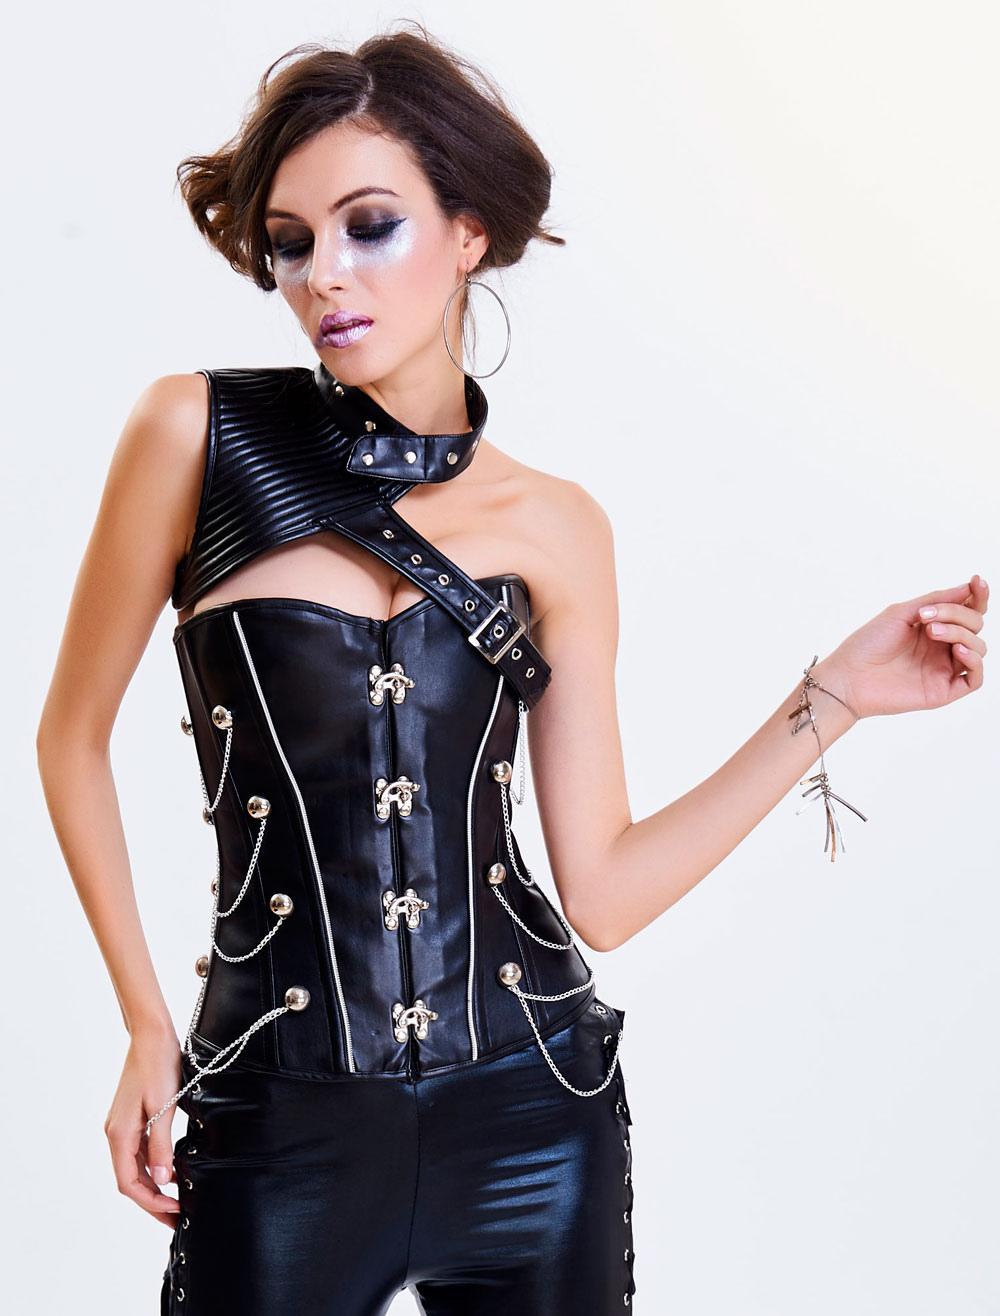 d1659ca563f Black Steampunk Costume Vintage Women s Asymmetrical Neckline ...